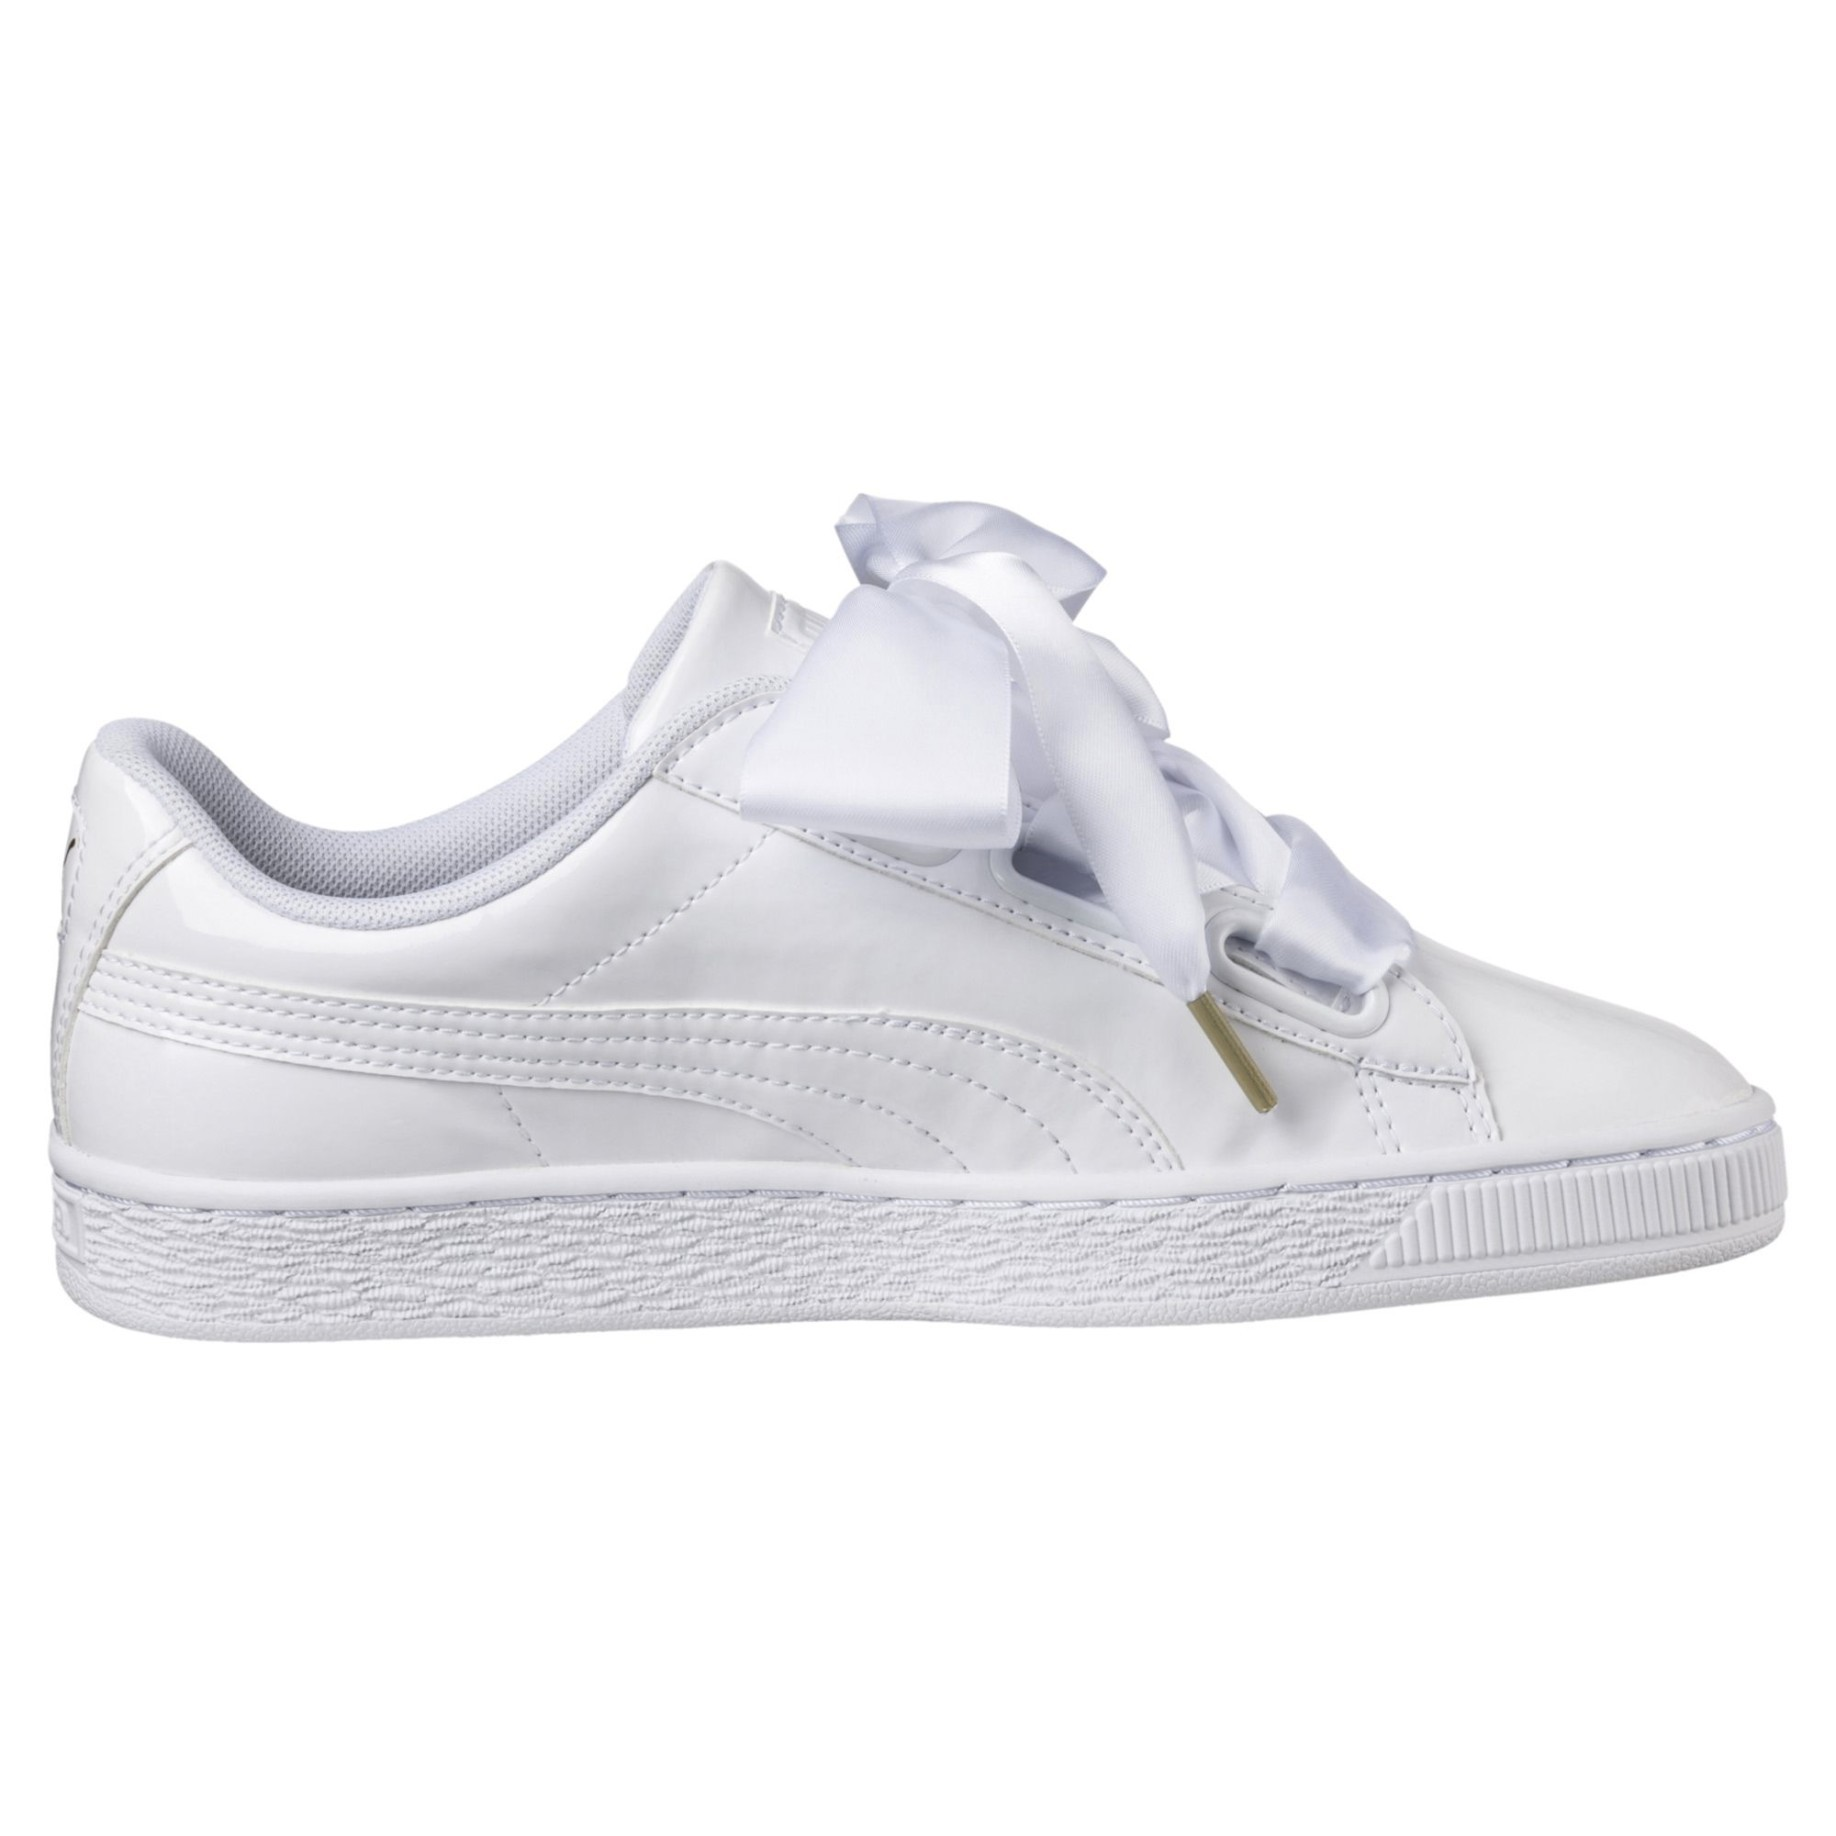 promo code 2e592 c96b7 Shoes Woman Basketball Heart Patent